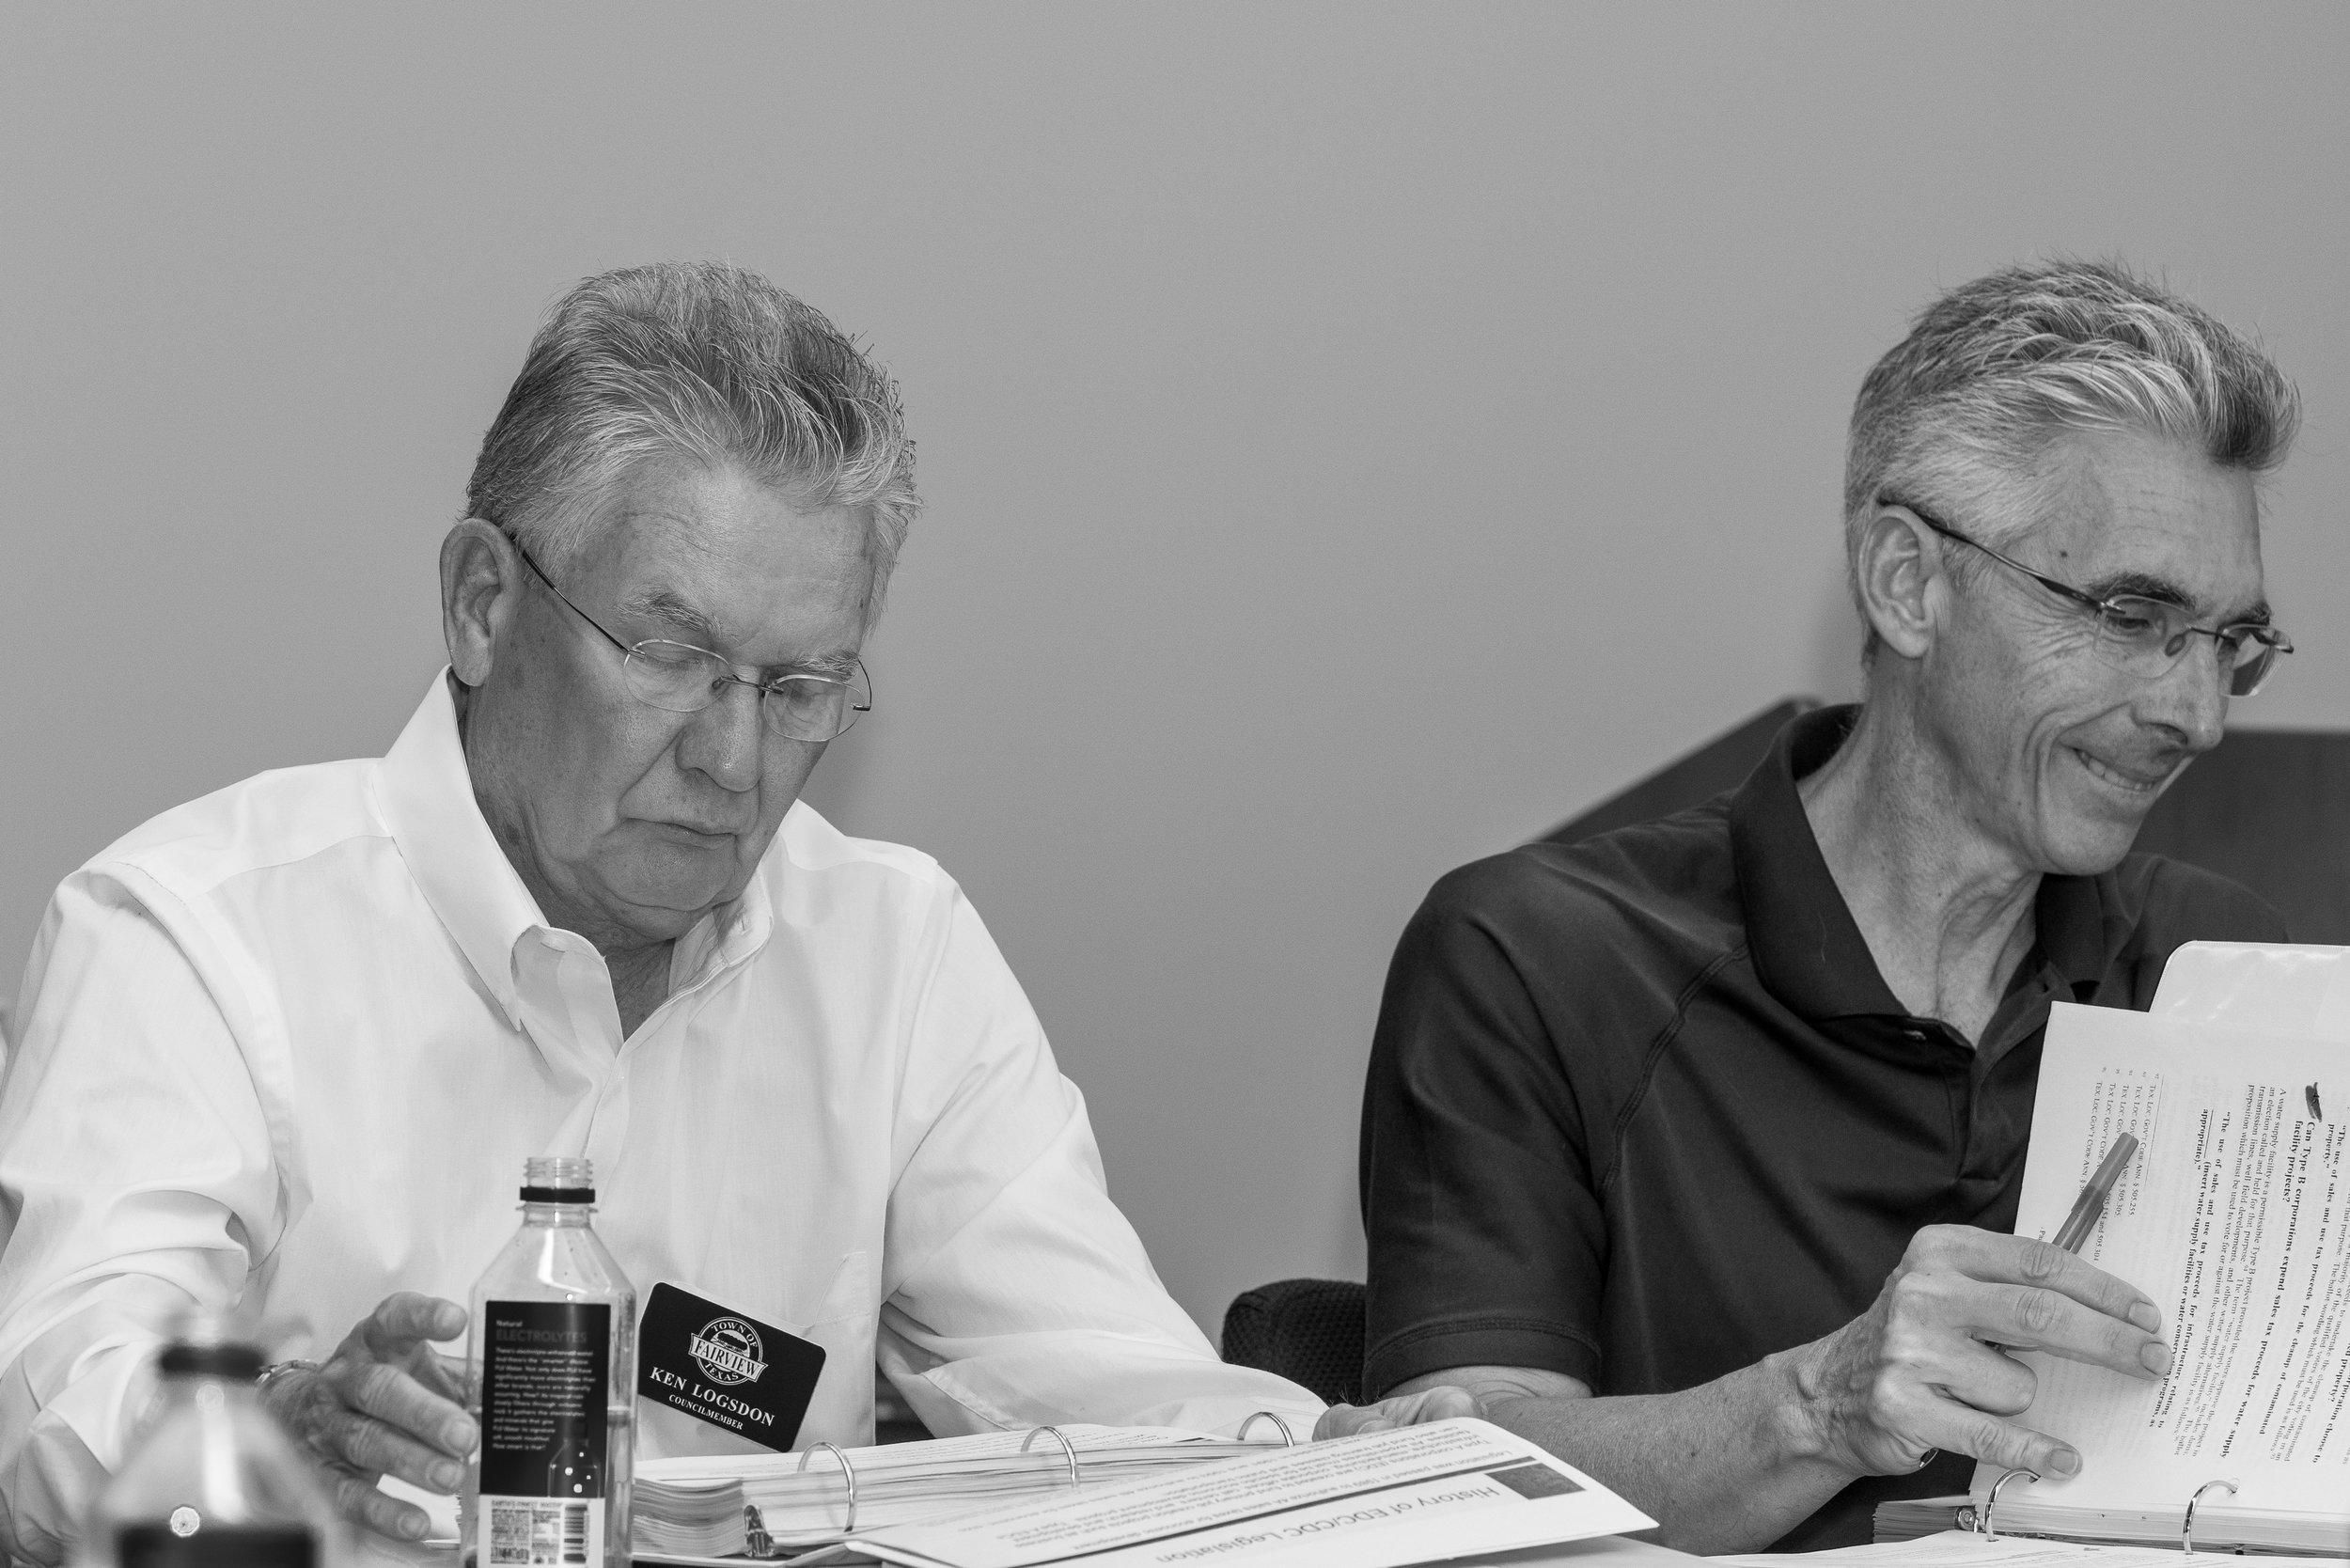 fairview councilCouncilmembers Ken Logsdon (l) and Tony Mattei (r).jpg